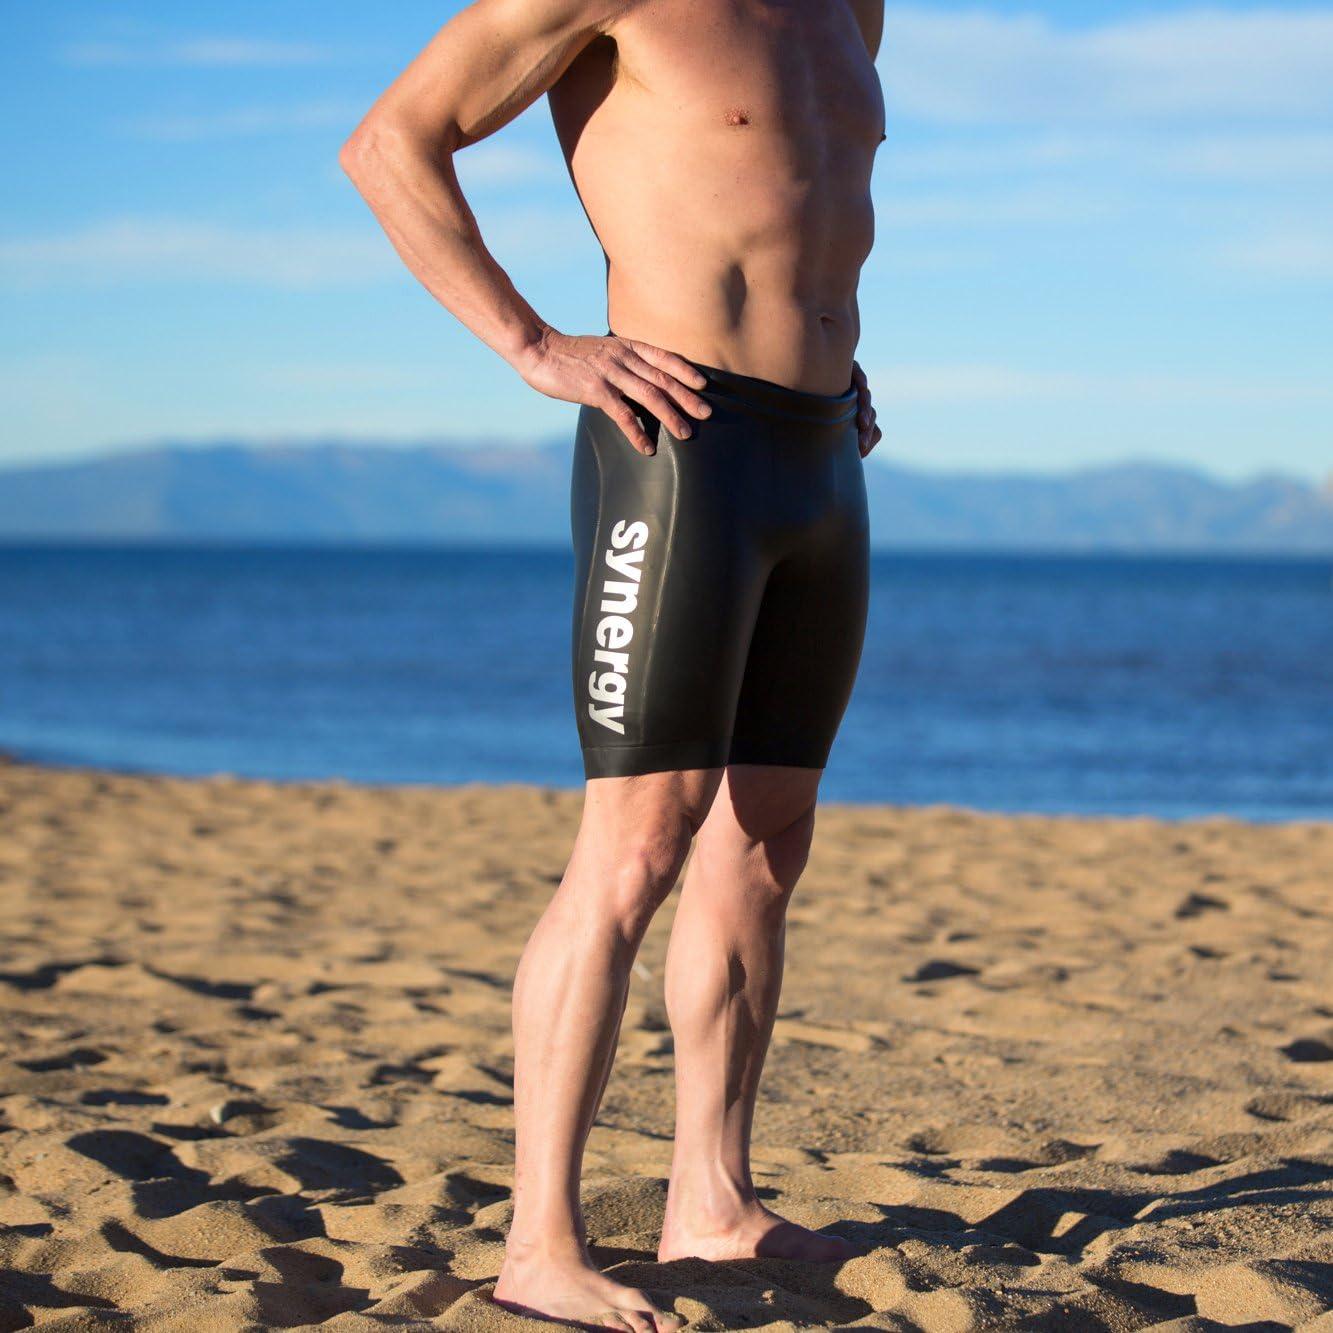 Synergy Triathlon Wetsuit Buoyancy Shorts Mens EpicSpeed Neoprene Shorts for Open Water Swimming